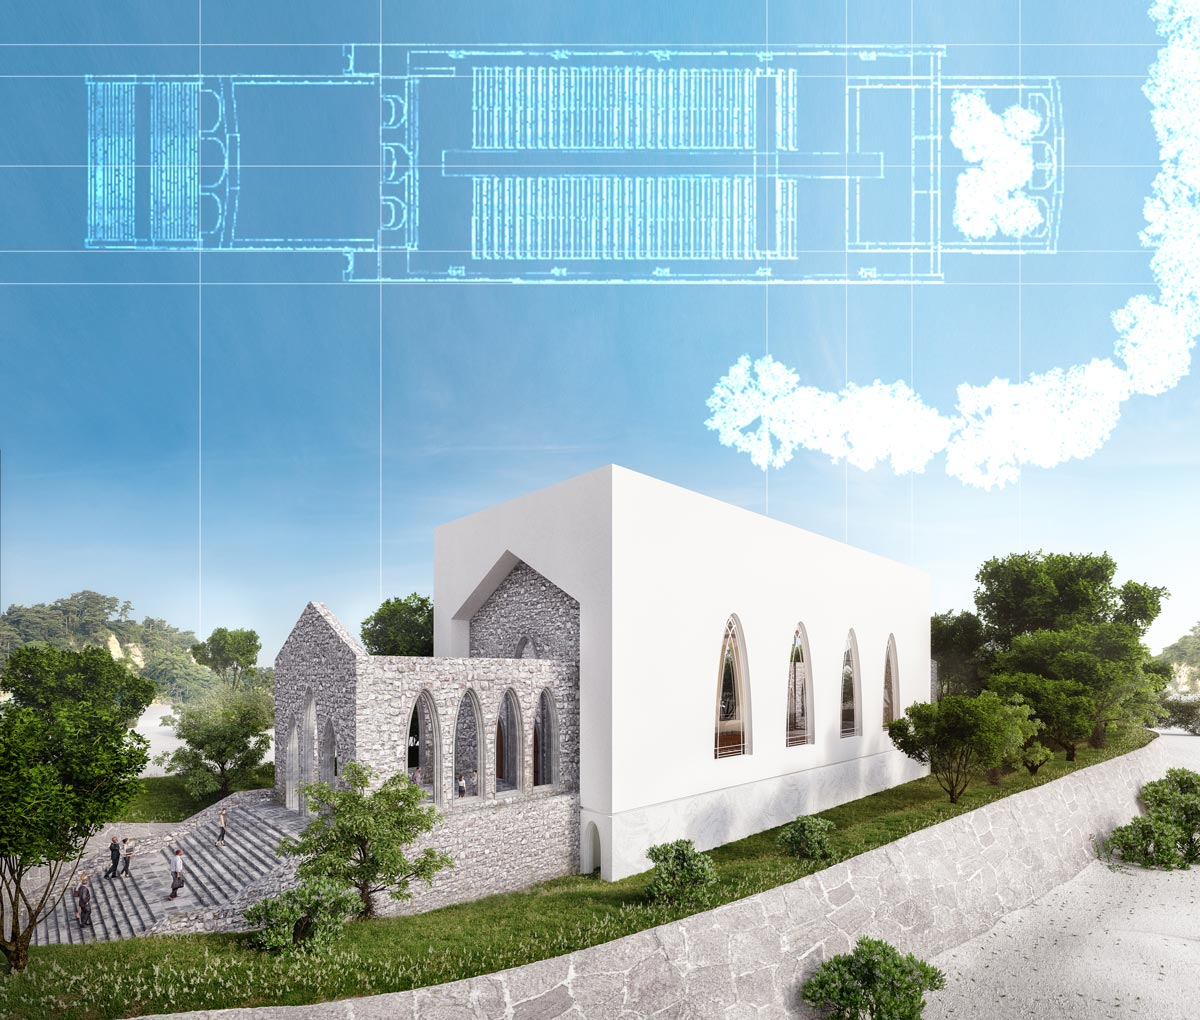 church-of-freeport-bahamas-1.jpg